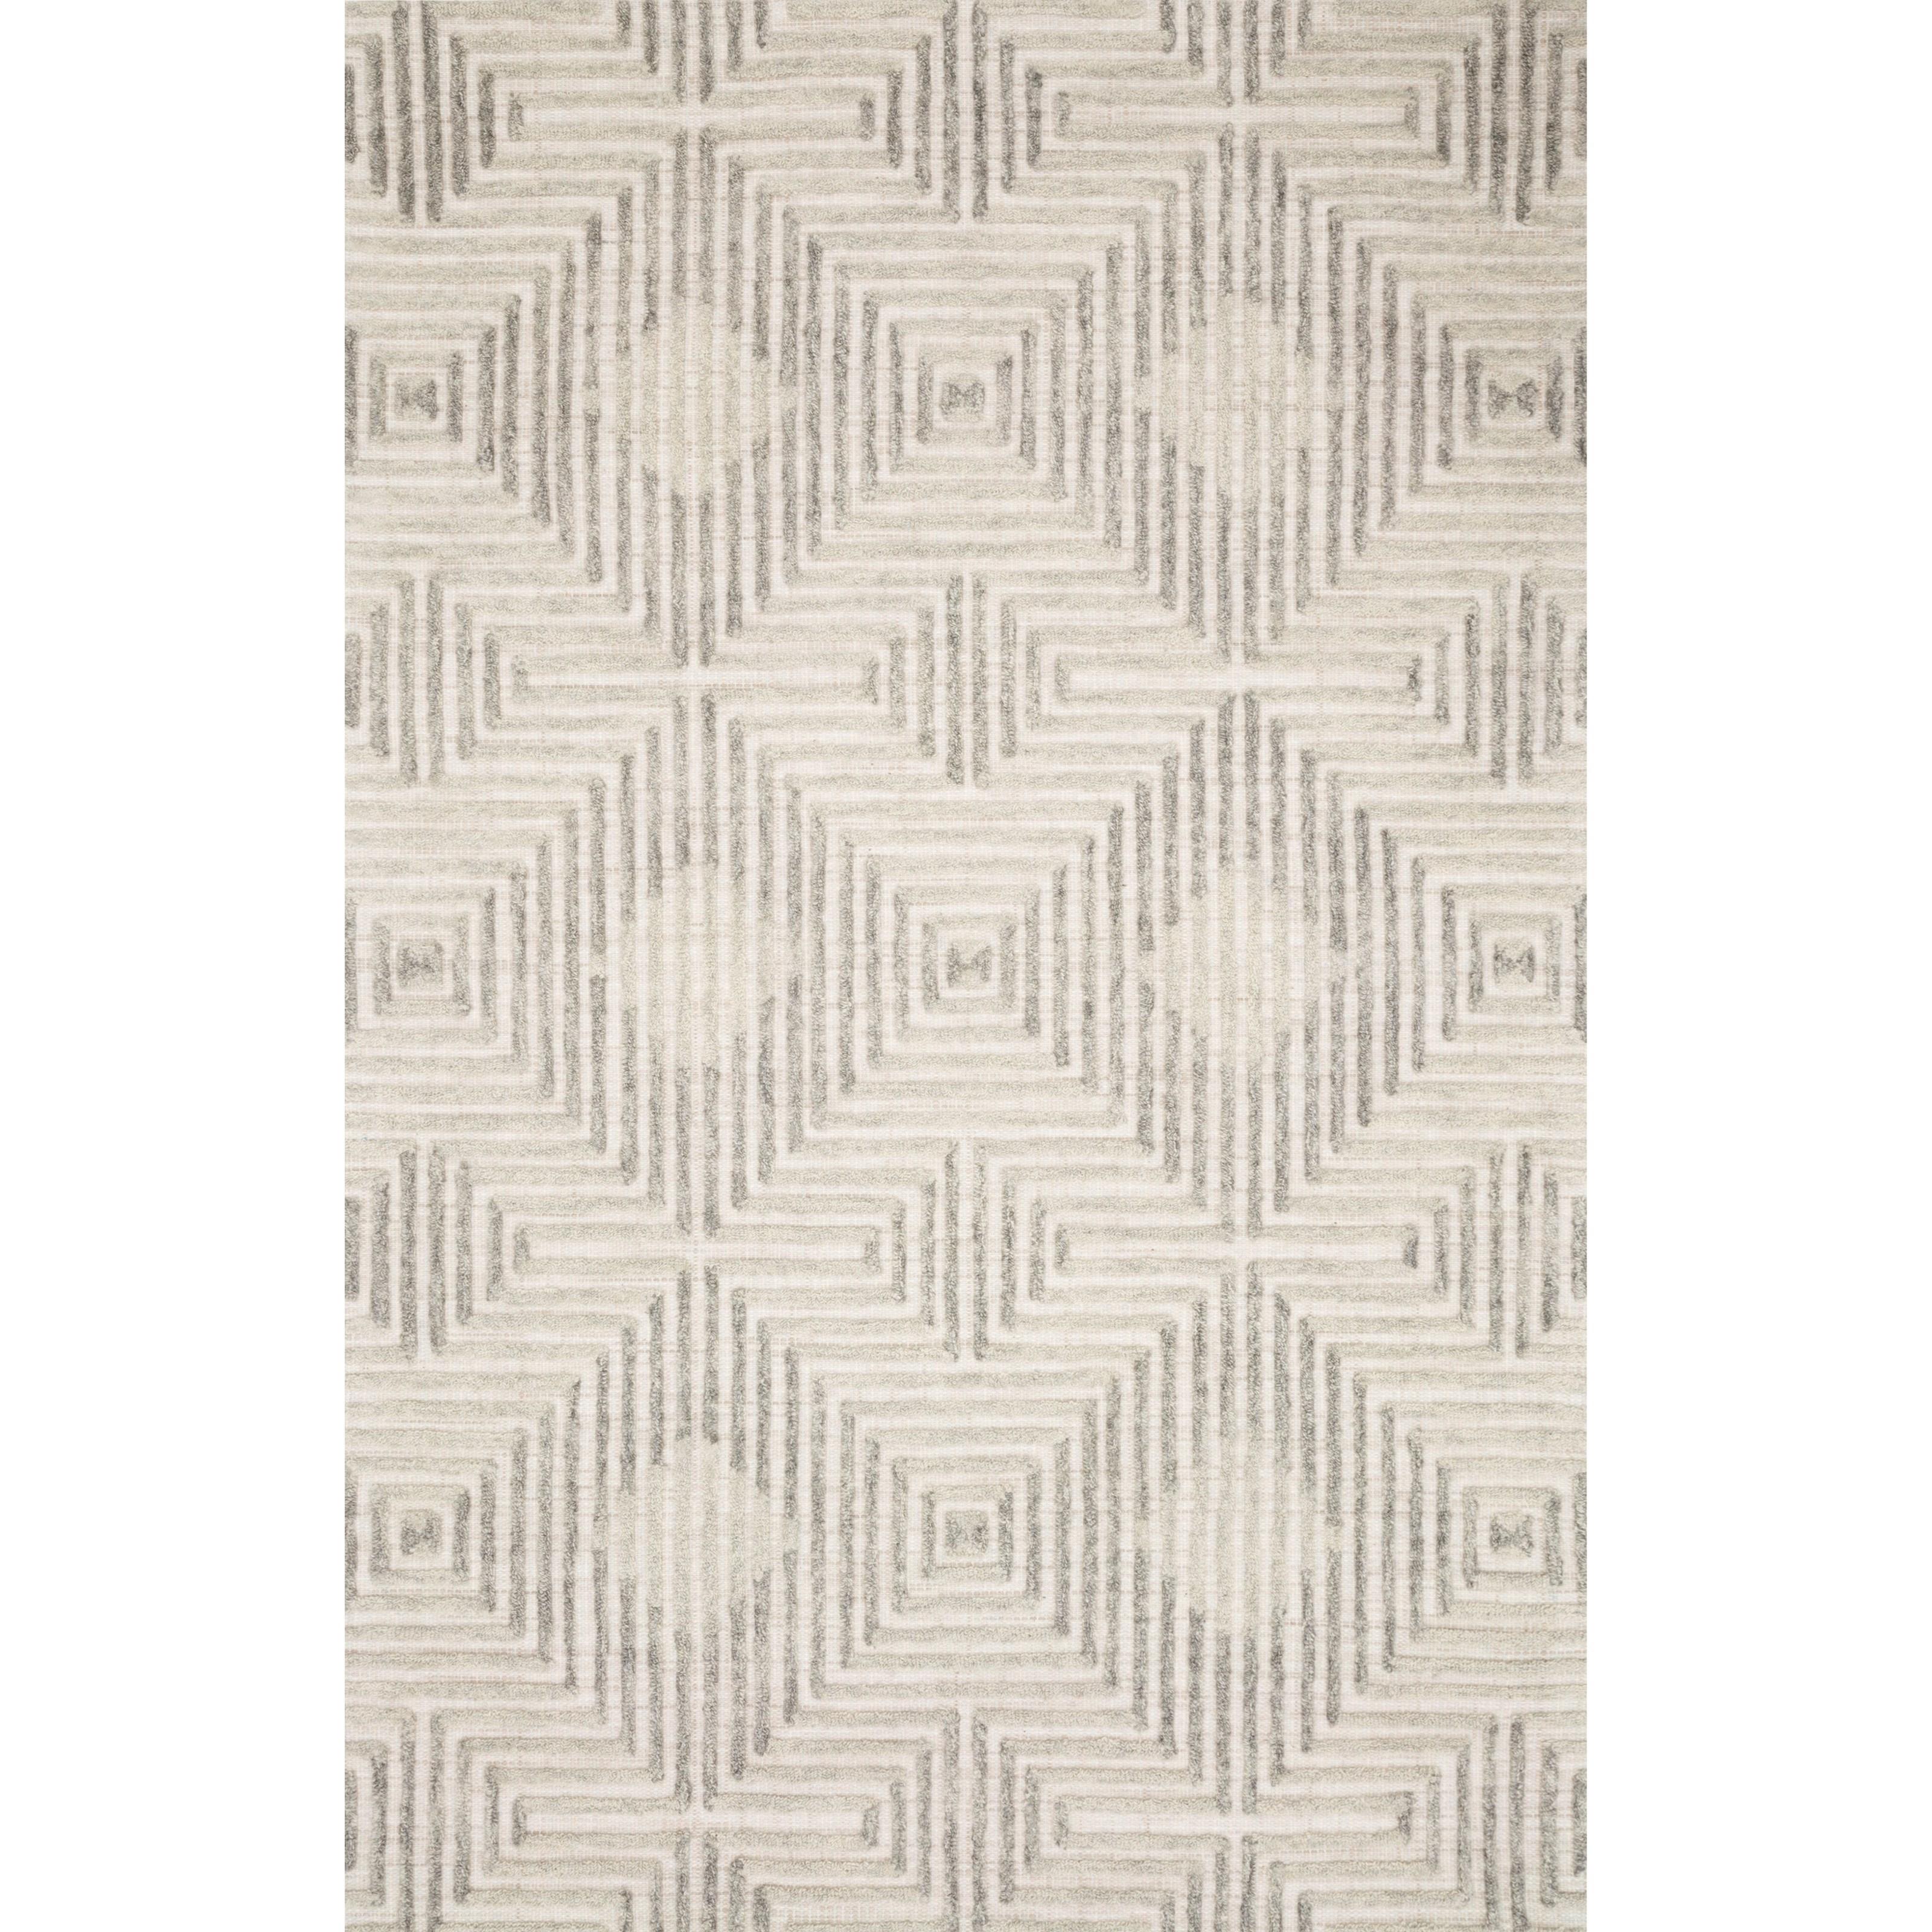 "Ehren 11'6"" x 15' Grey / Silver Rug by Loloi Rugs at Virginia Furniture Market"